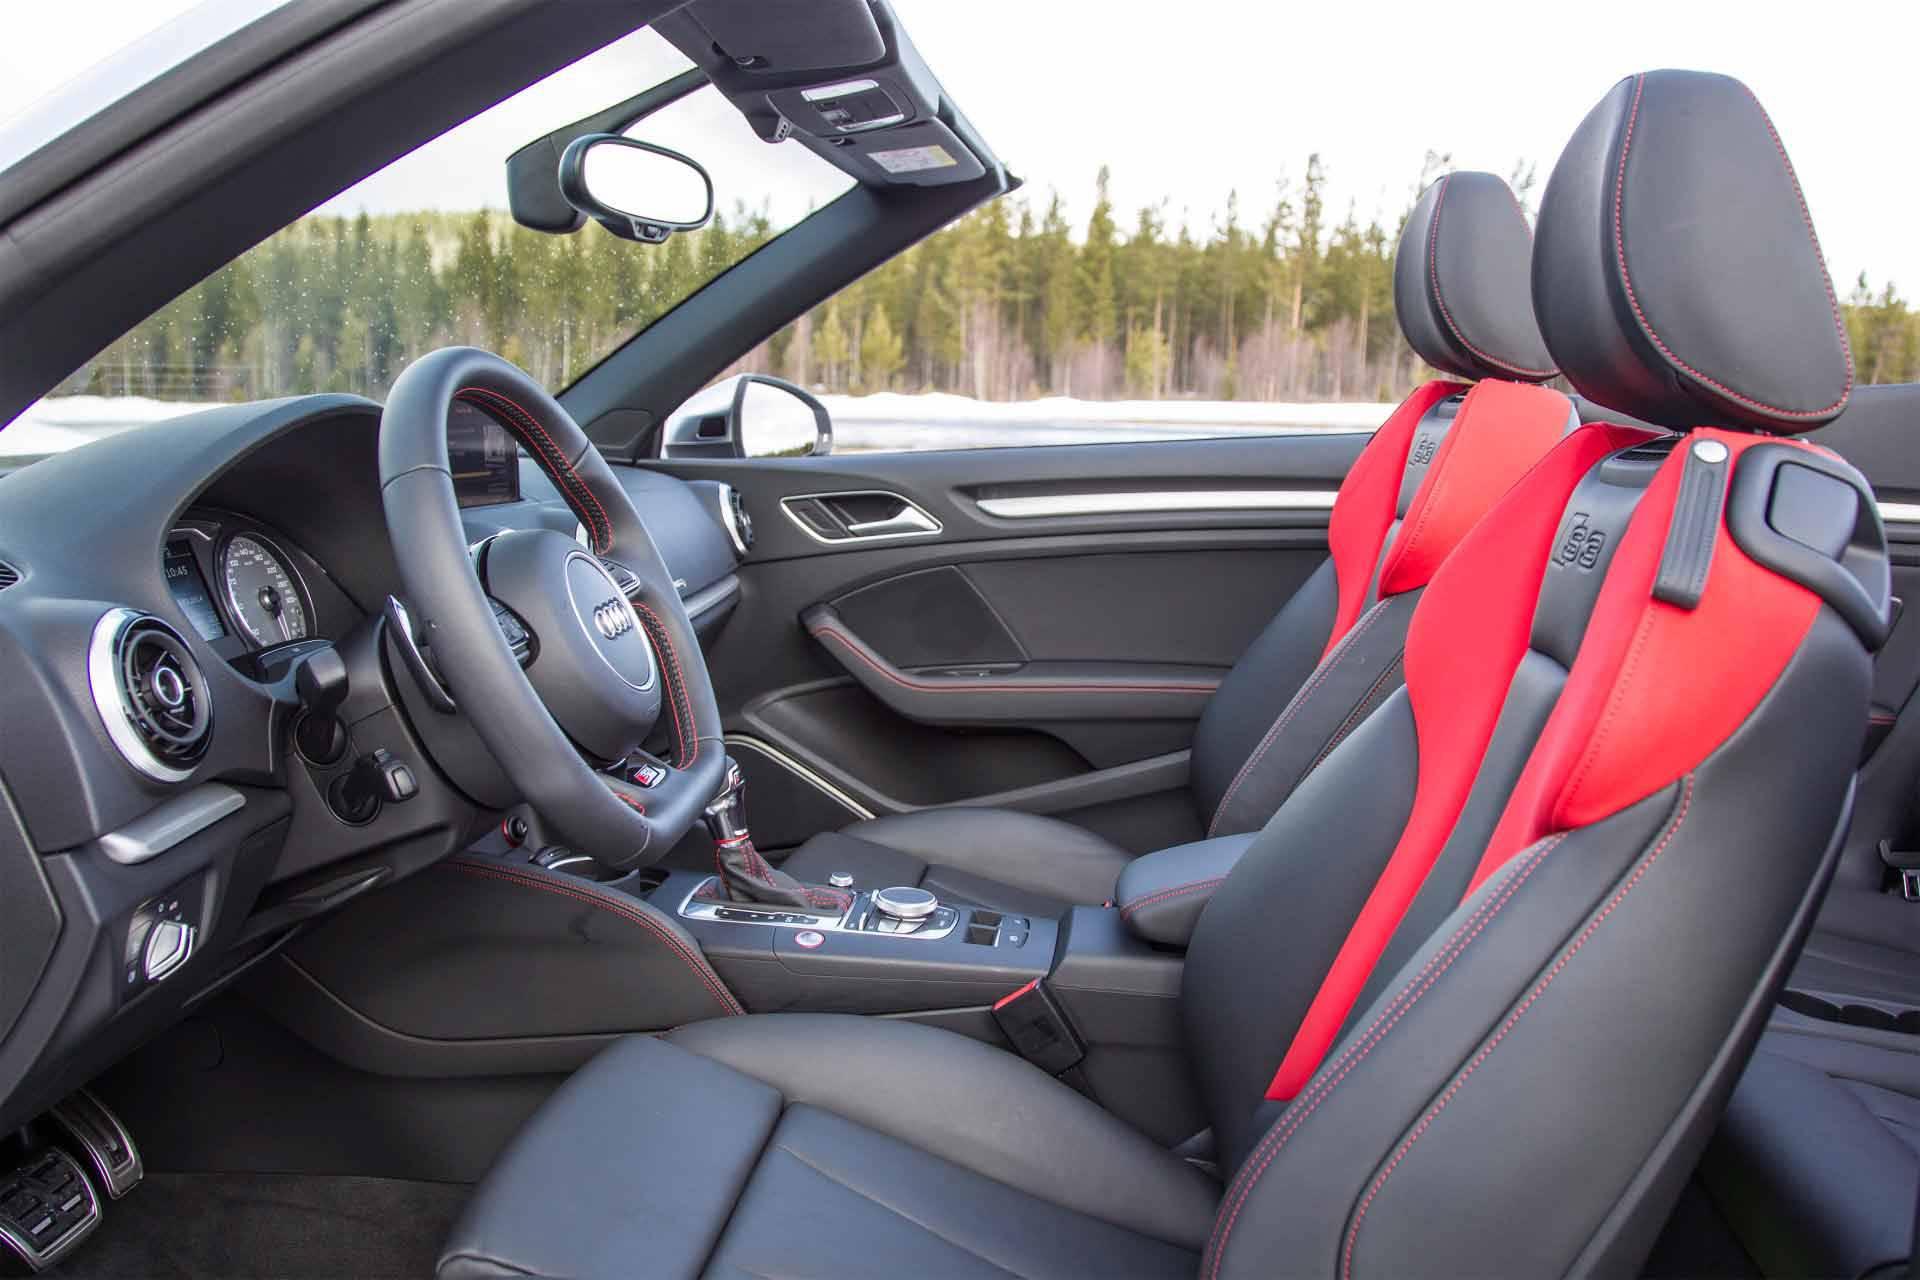 _Audi-S3-Cabrio-innen-vorne